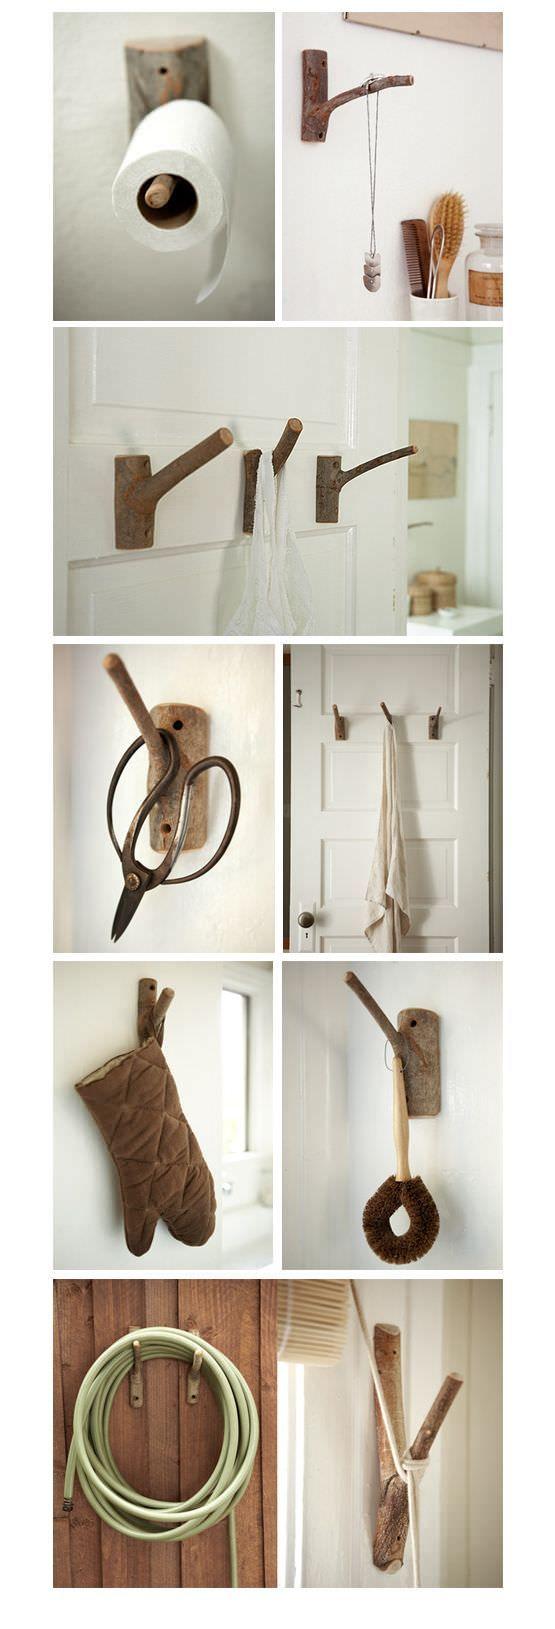 DIY: Branch Hooks #Branch, #DIY, #Hooks, #Upcycled, #Wood